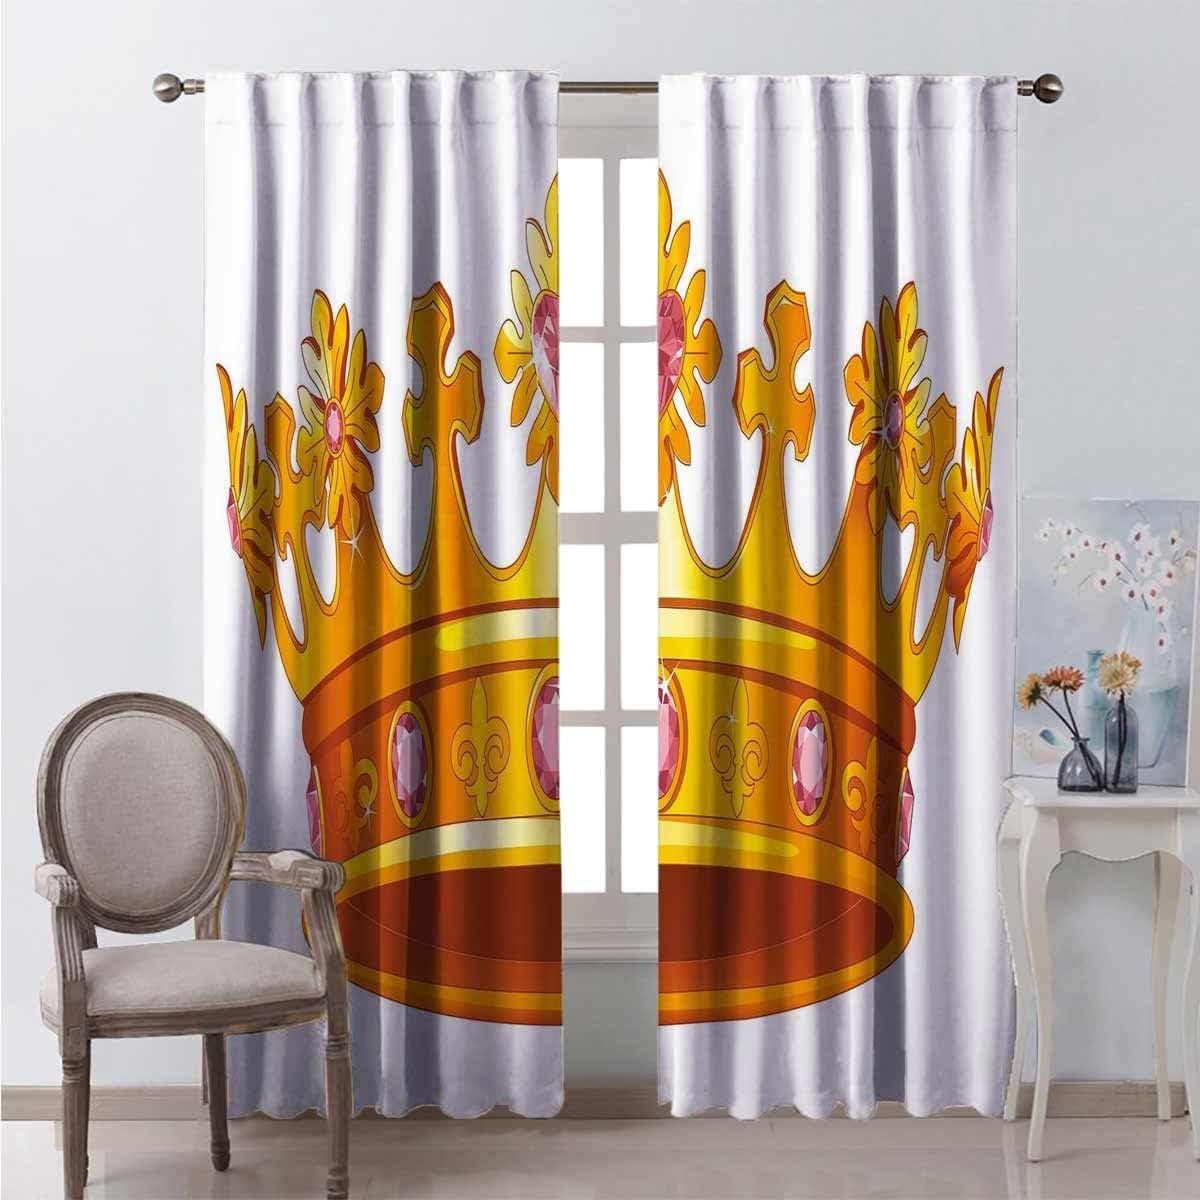 Toopeek Queen - Cortina de aislamiento térmico con corona de color dorado con piedras preciosas rosas, símbolo de nobleza para sala de estar o dormitorio (84 x 84 cm), color amarillo claro